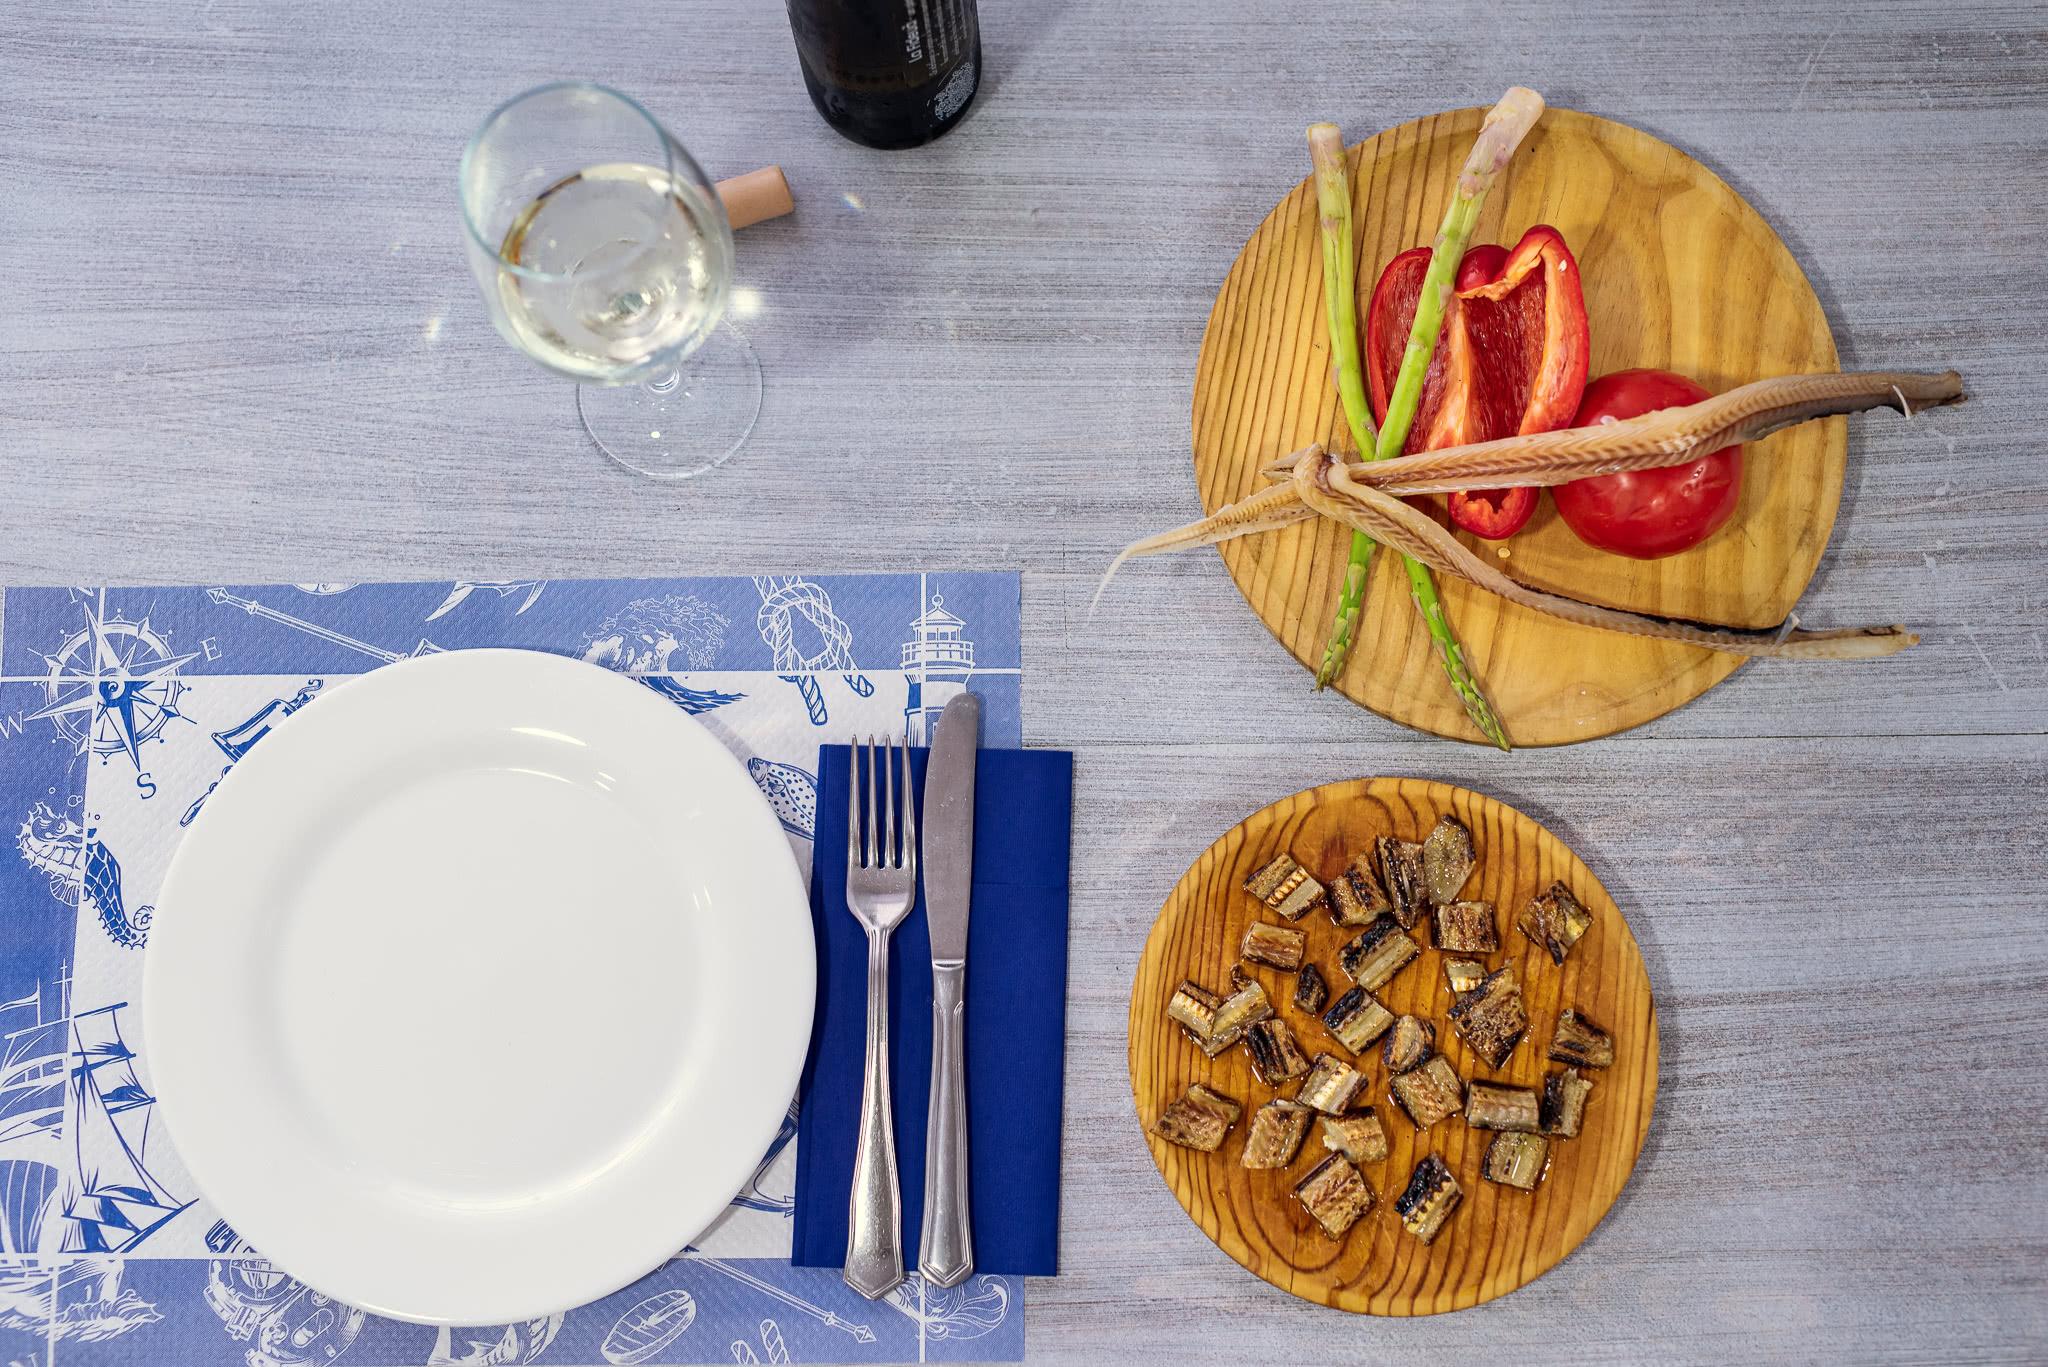 Chef Amadeo 138 - 25580